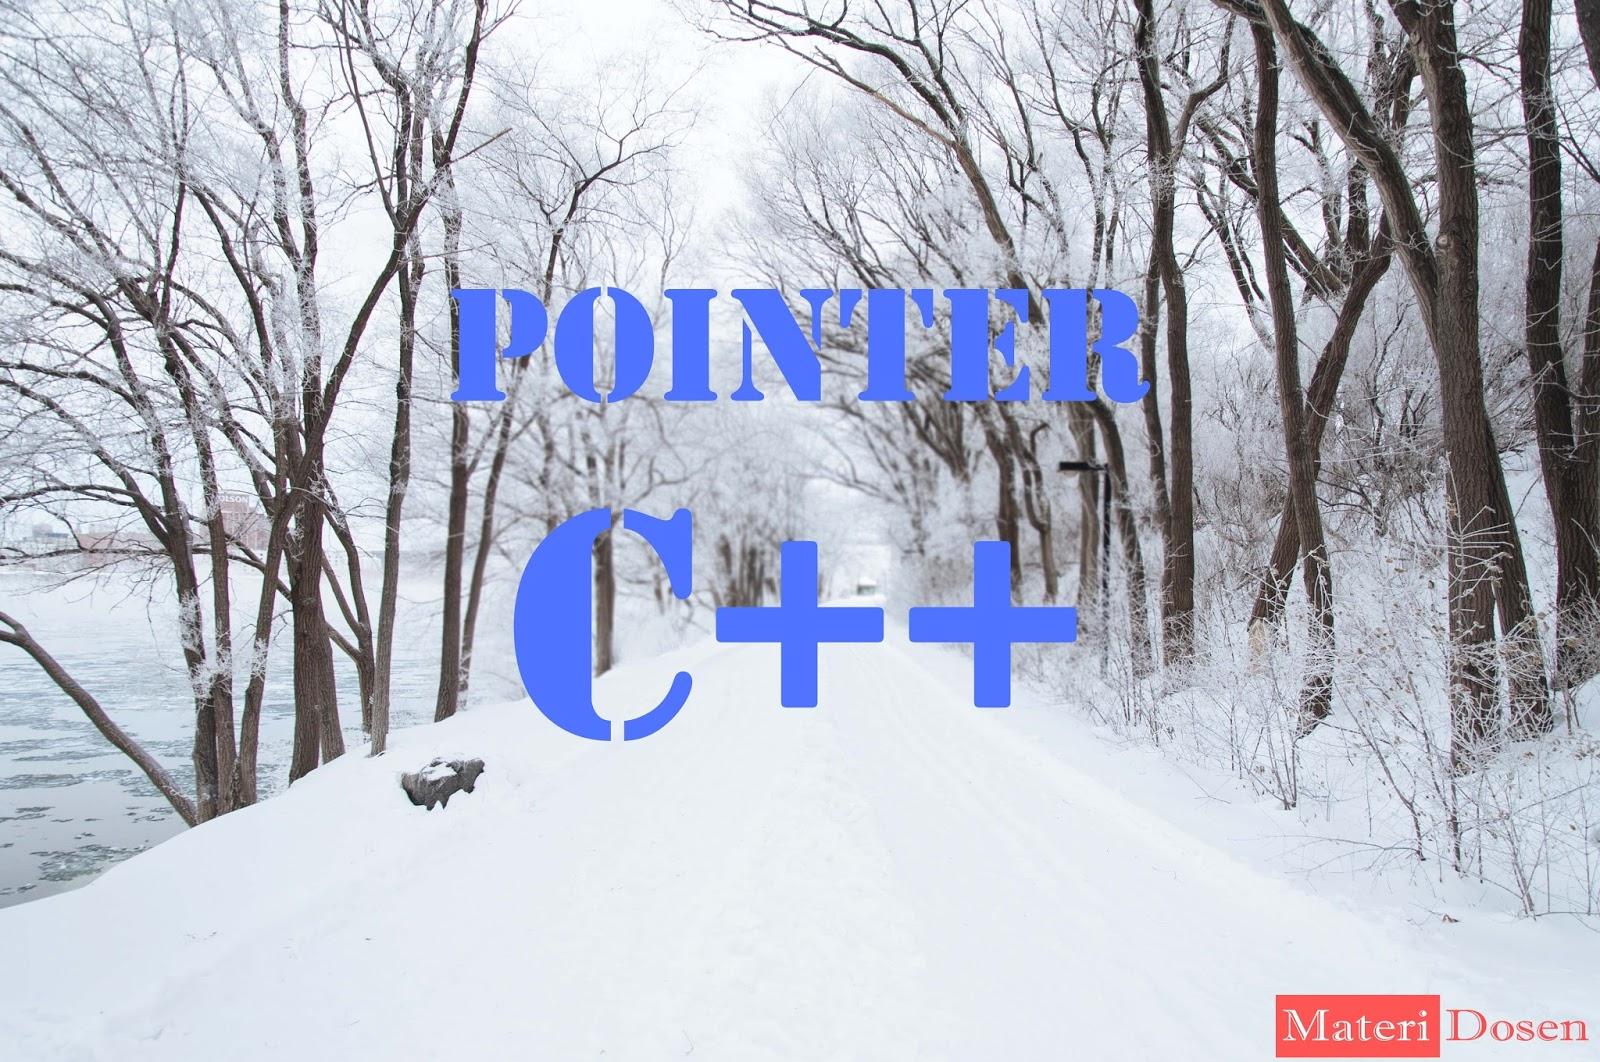 Pointer%2Bpada%2BC%252B%252B%252C%2BLengkap%2BContoh%2BProgram%2Bdan%2BPembahasan - Jenis Jenis Pointer C